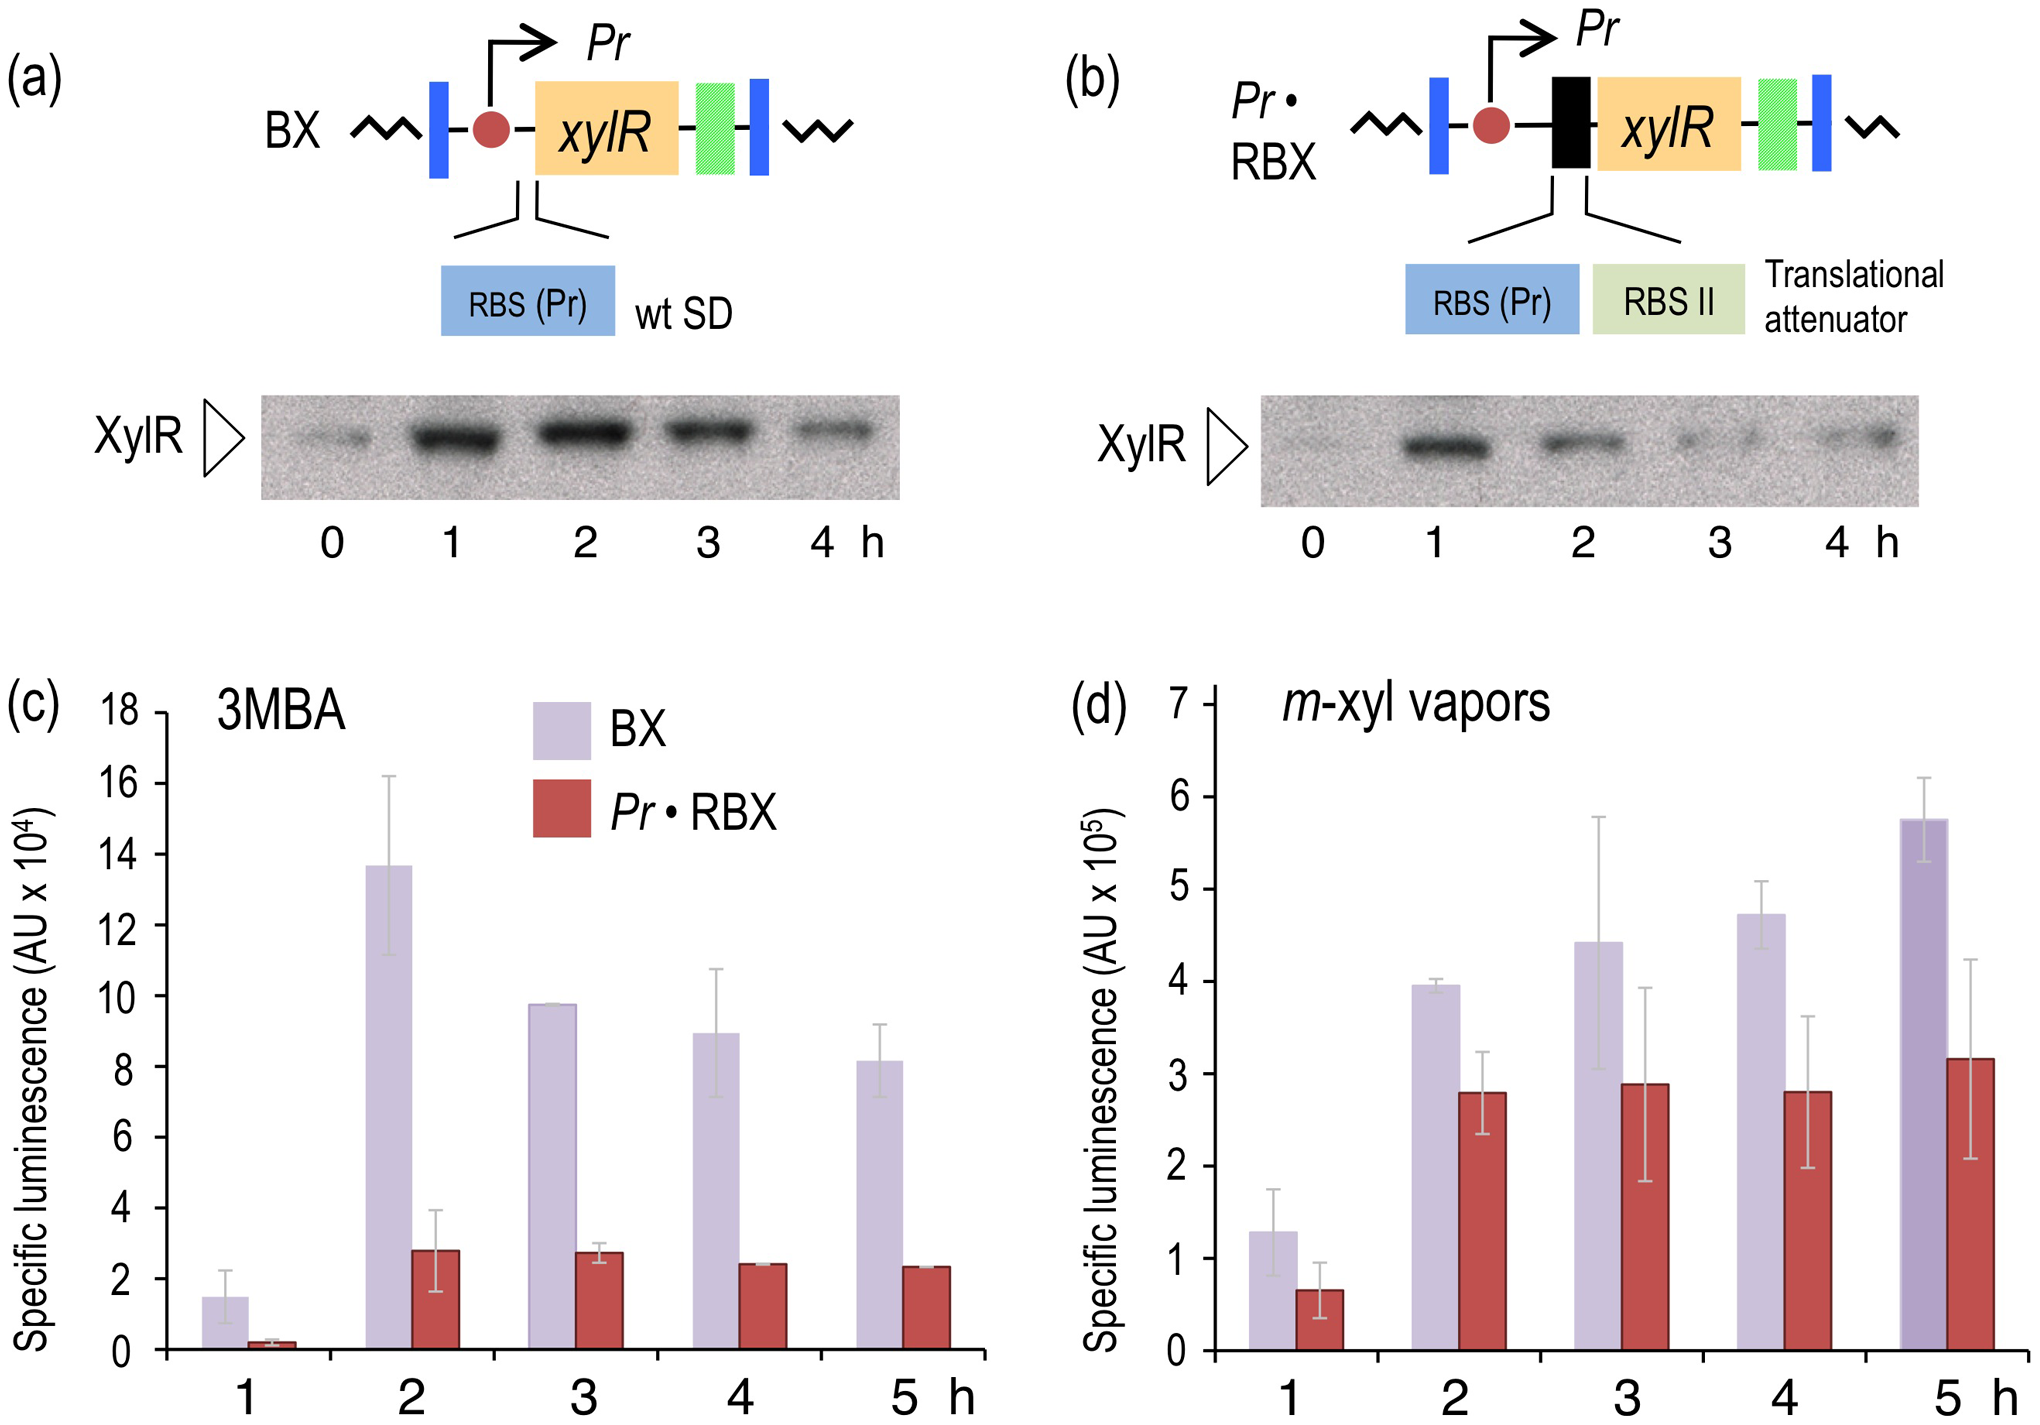 Effect of translational attenuation on performance of the XylR/<i>Pu</i> regulatory node.